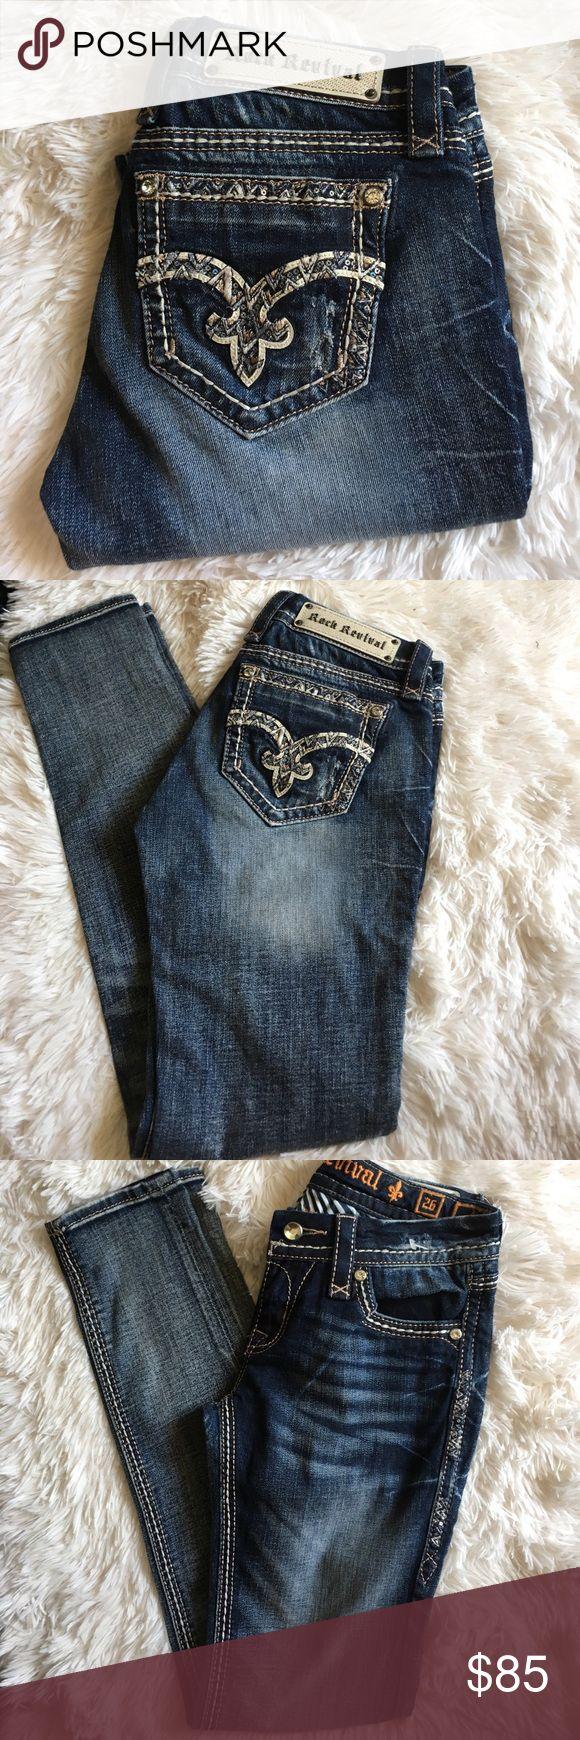 ❤️️New Rock Revival Denim Jeans❤️ New Rock Revival denim jeans, July,Cuffed Skinny❤️️ inseam 31 ( without cuff) Rock Revival Jeans Skinny